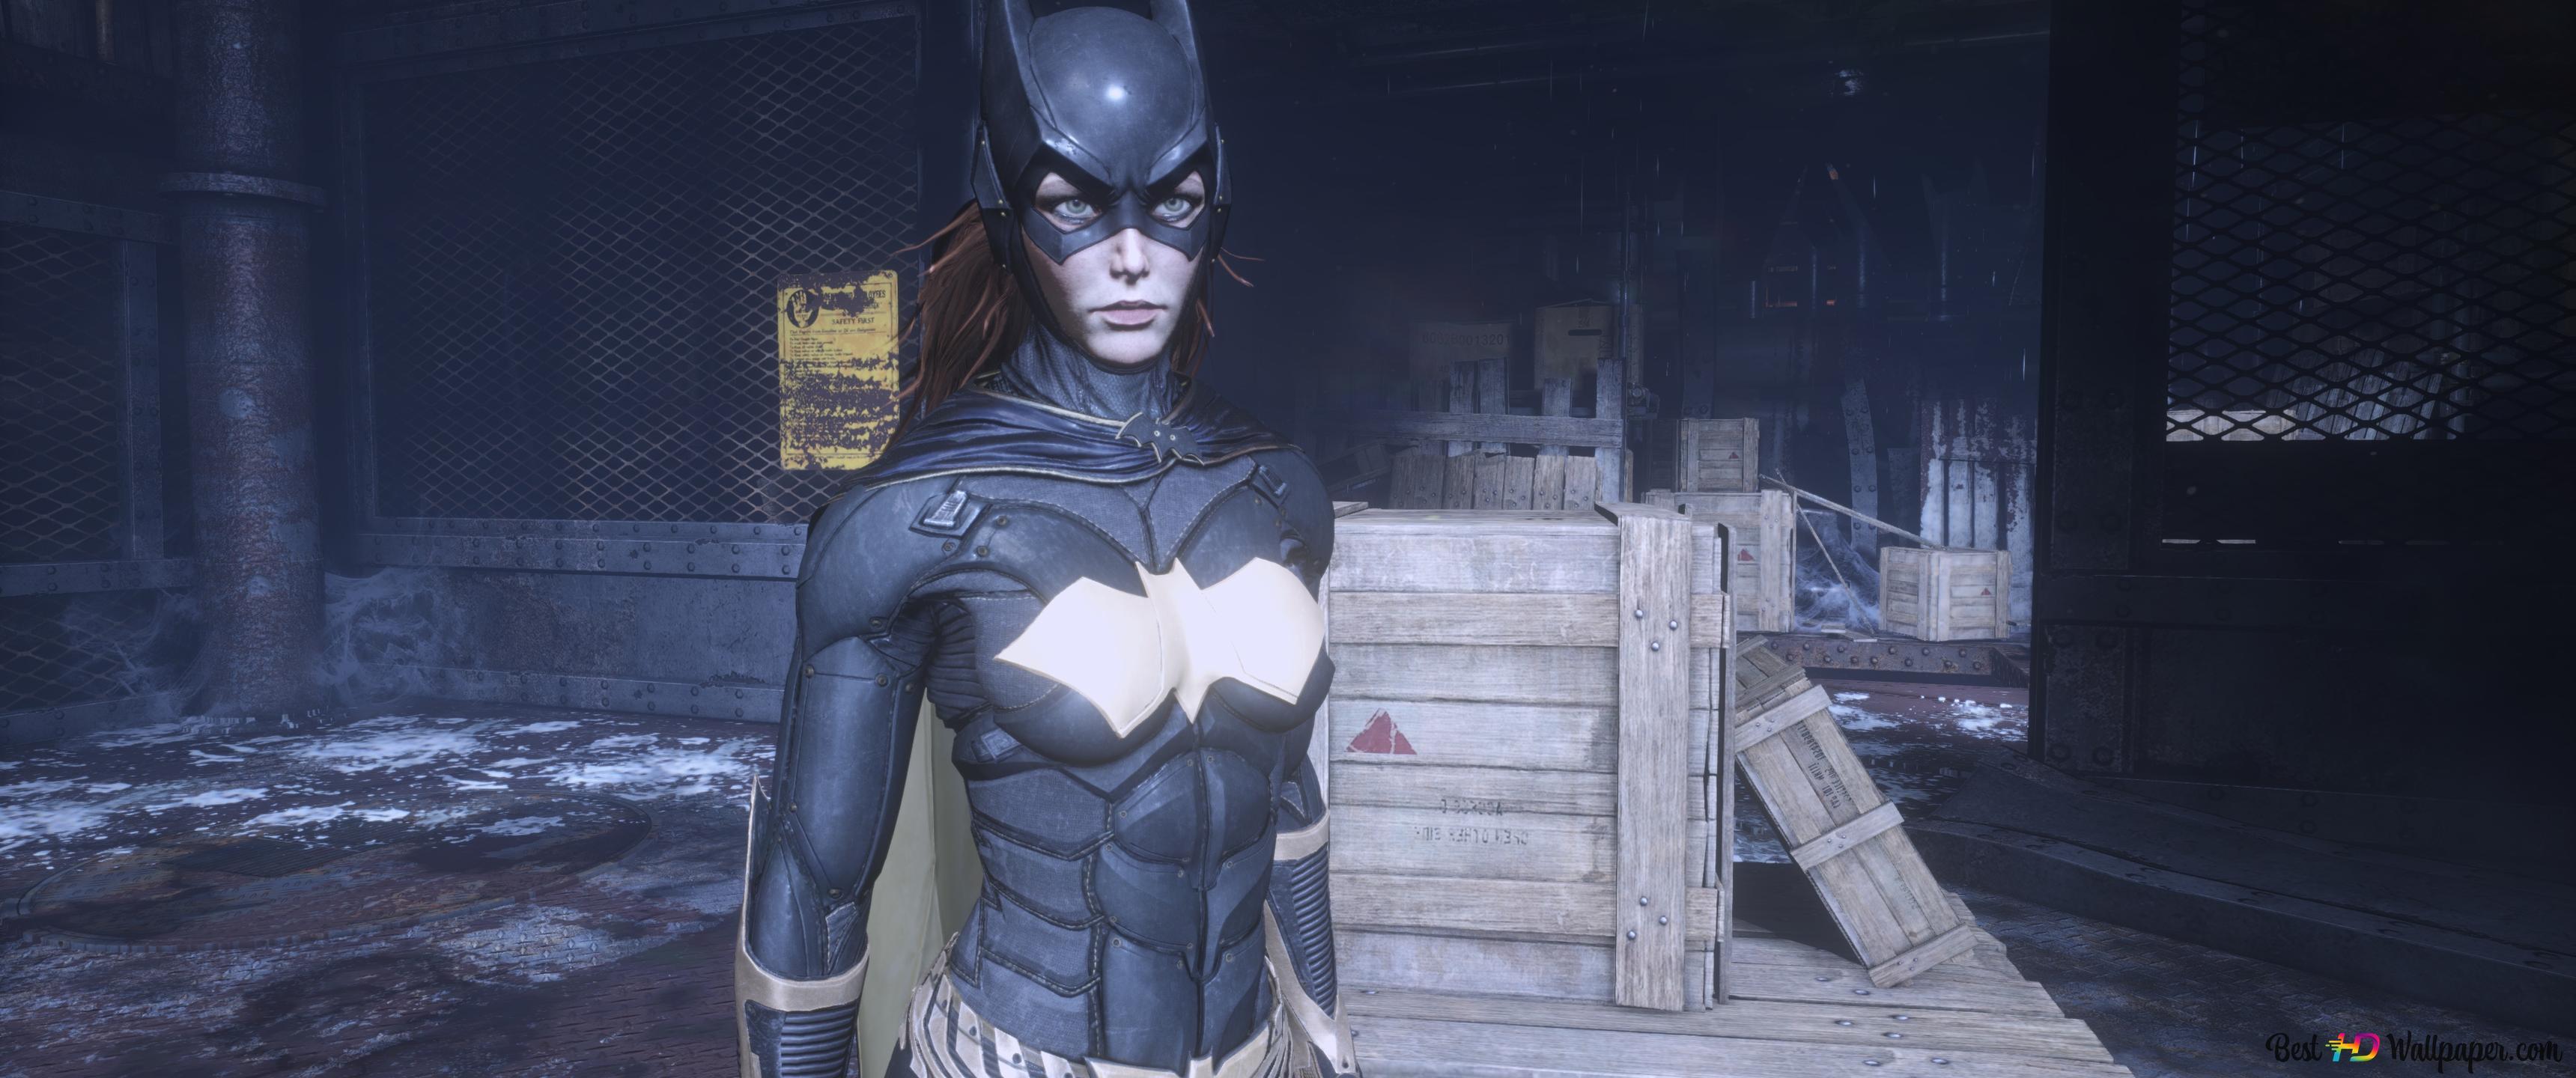 Batman Arkham Knight Batgirl Hd Wallpaper Download